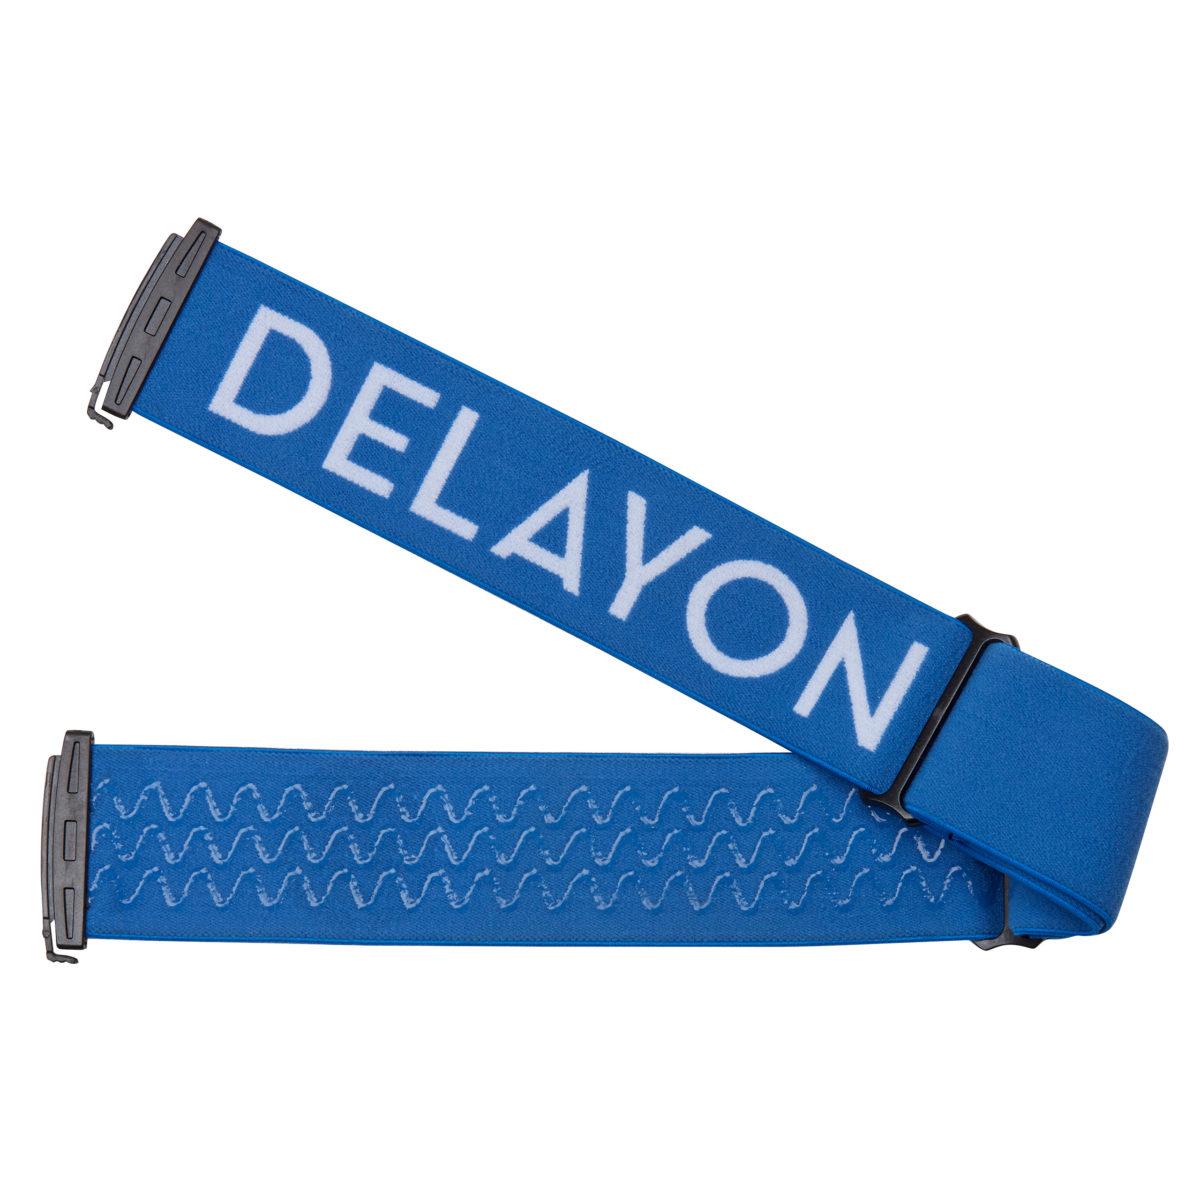 DELAYON Eyewear Explorer Goggle Strap Blue